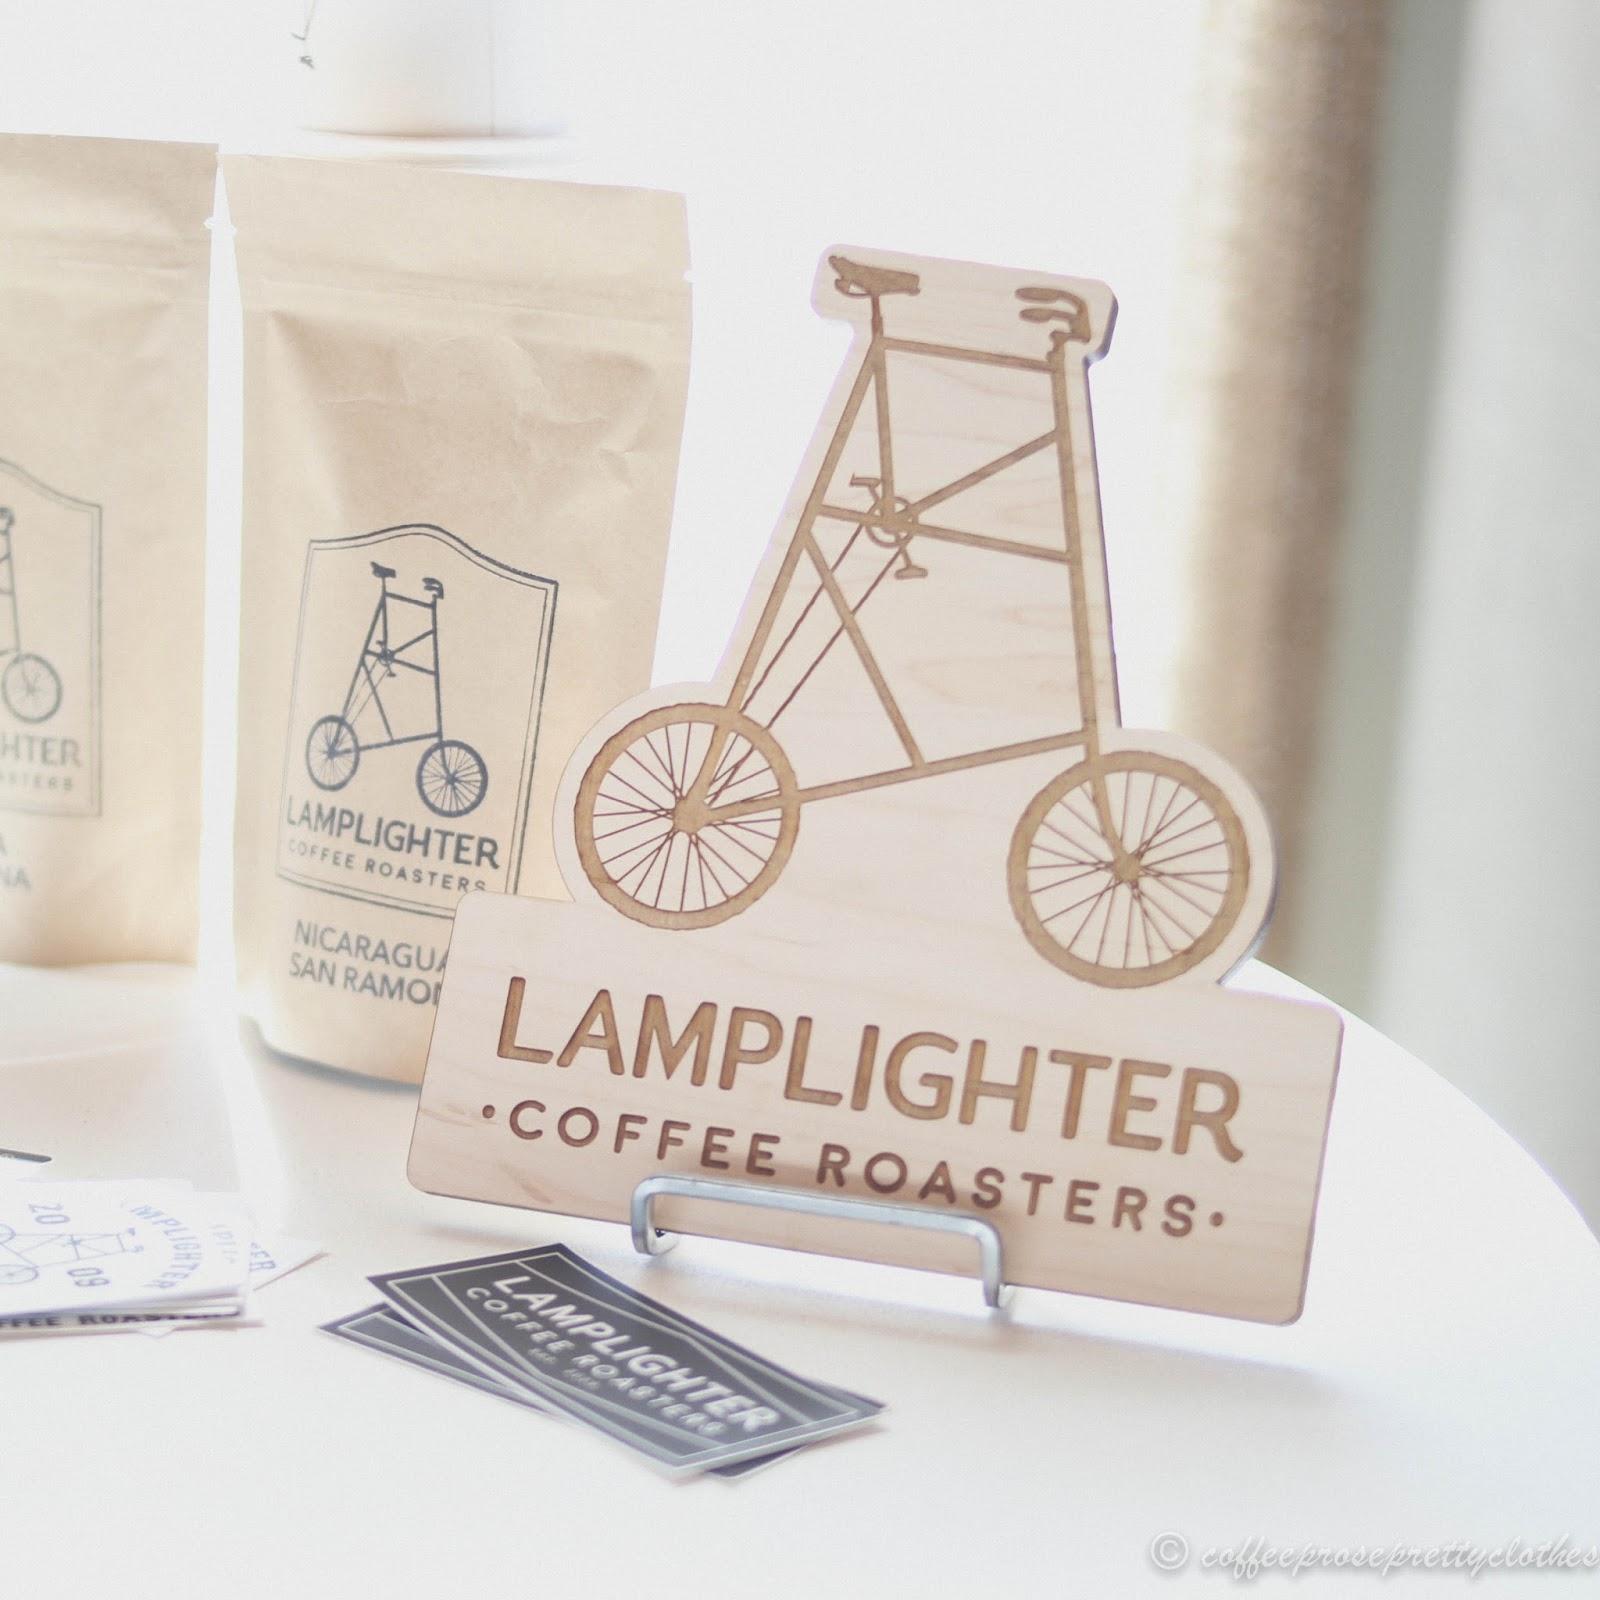 Coffee brewing, the Wydown, Coffee roasting, Lamplighter Coffee Roasters